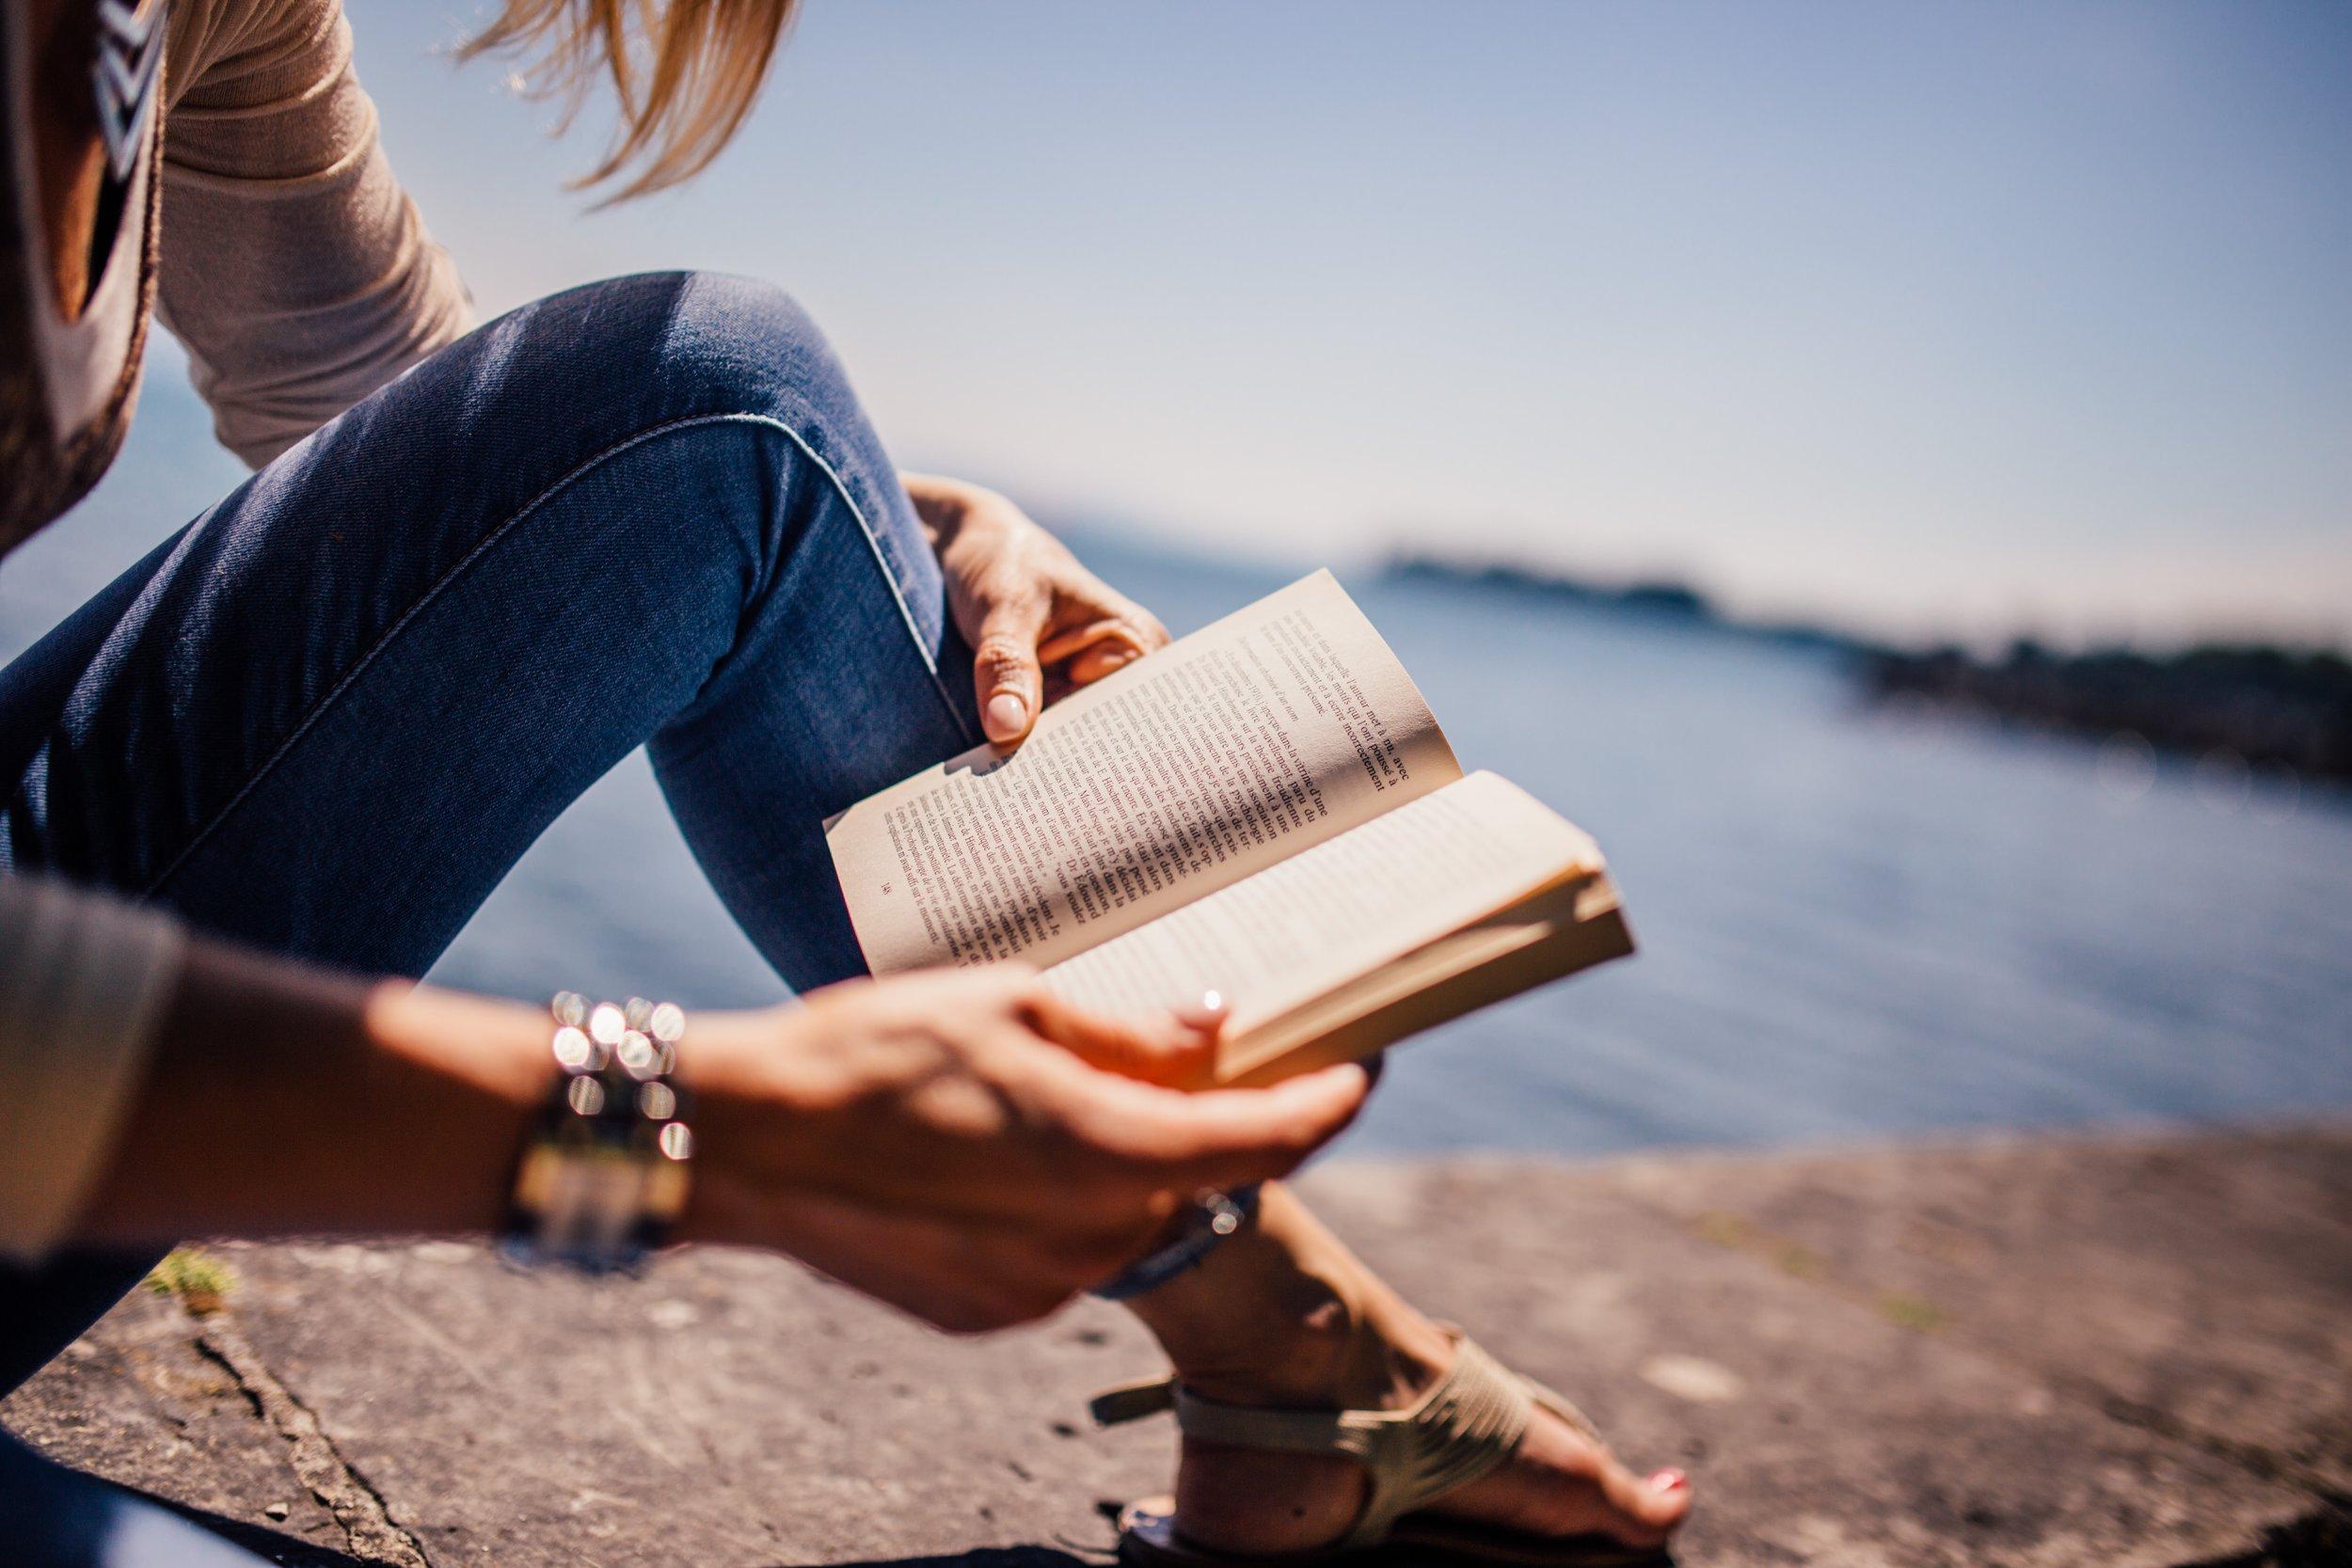 negative-space-woman-reading-book.jpg